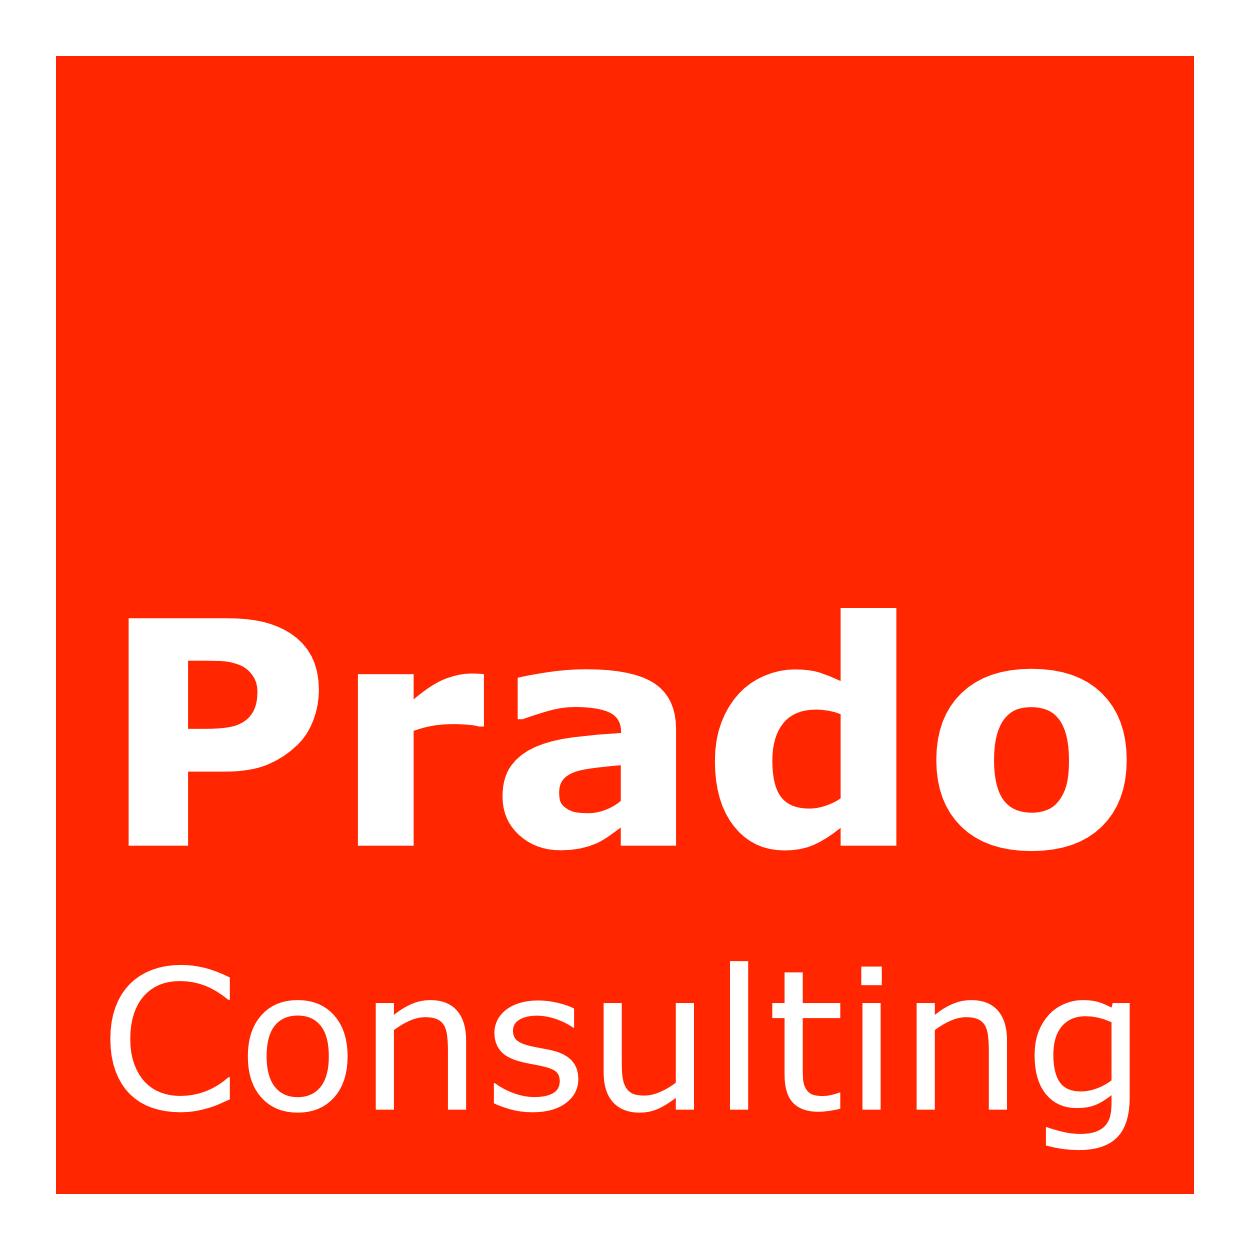 Gayraud - logo Prado Consulting.png